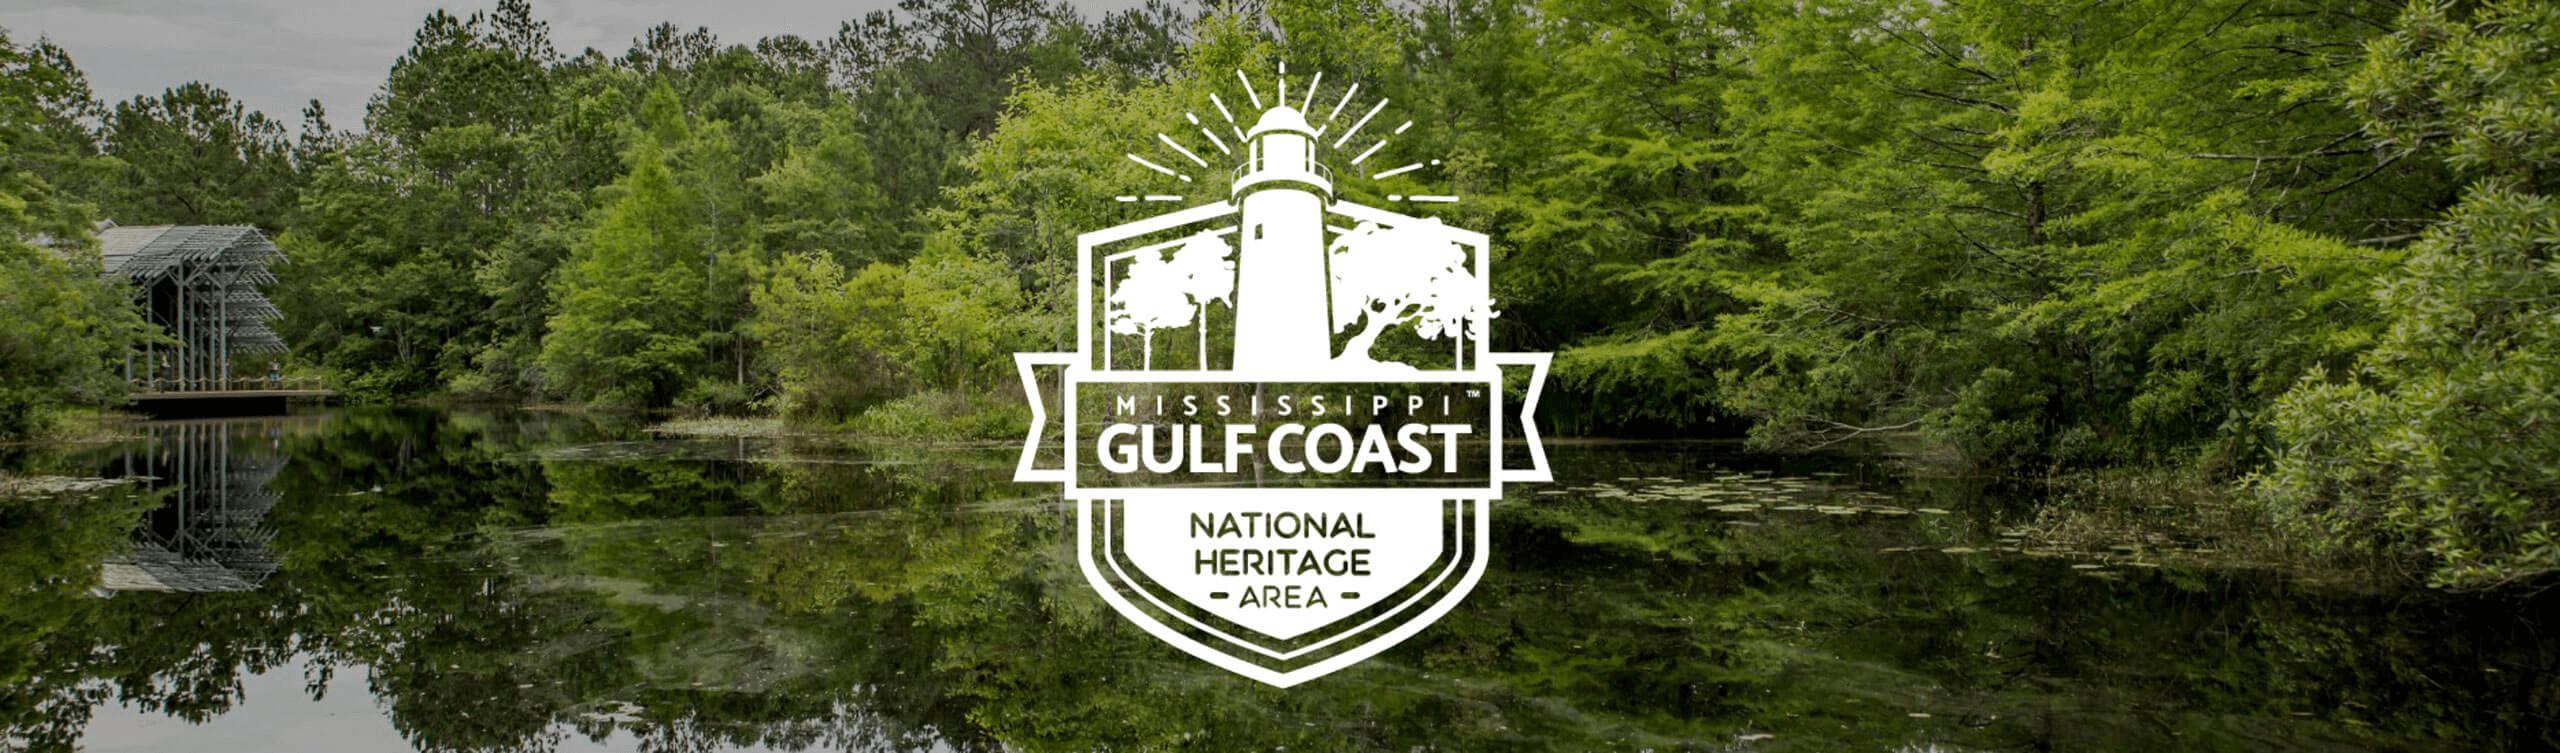 Extra Image Mississippi Gulf Coast <br>National Heritage Area